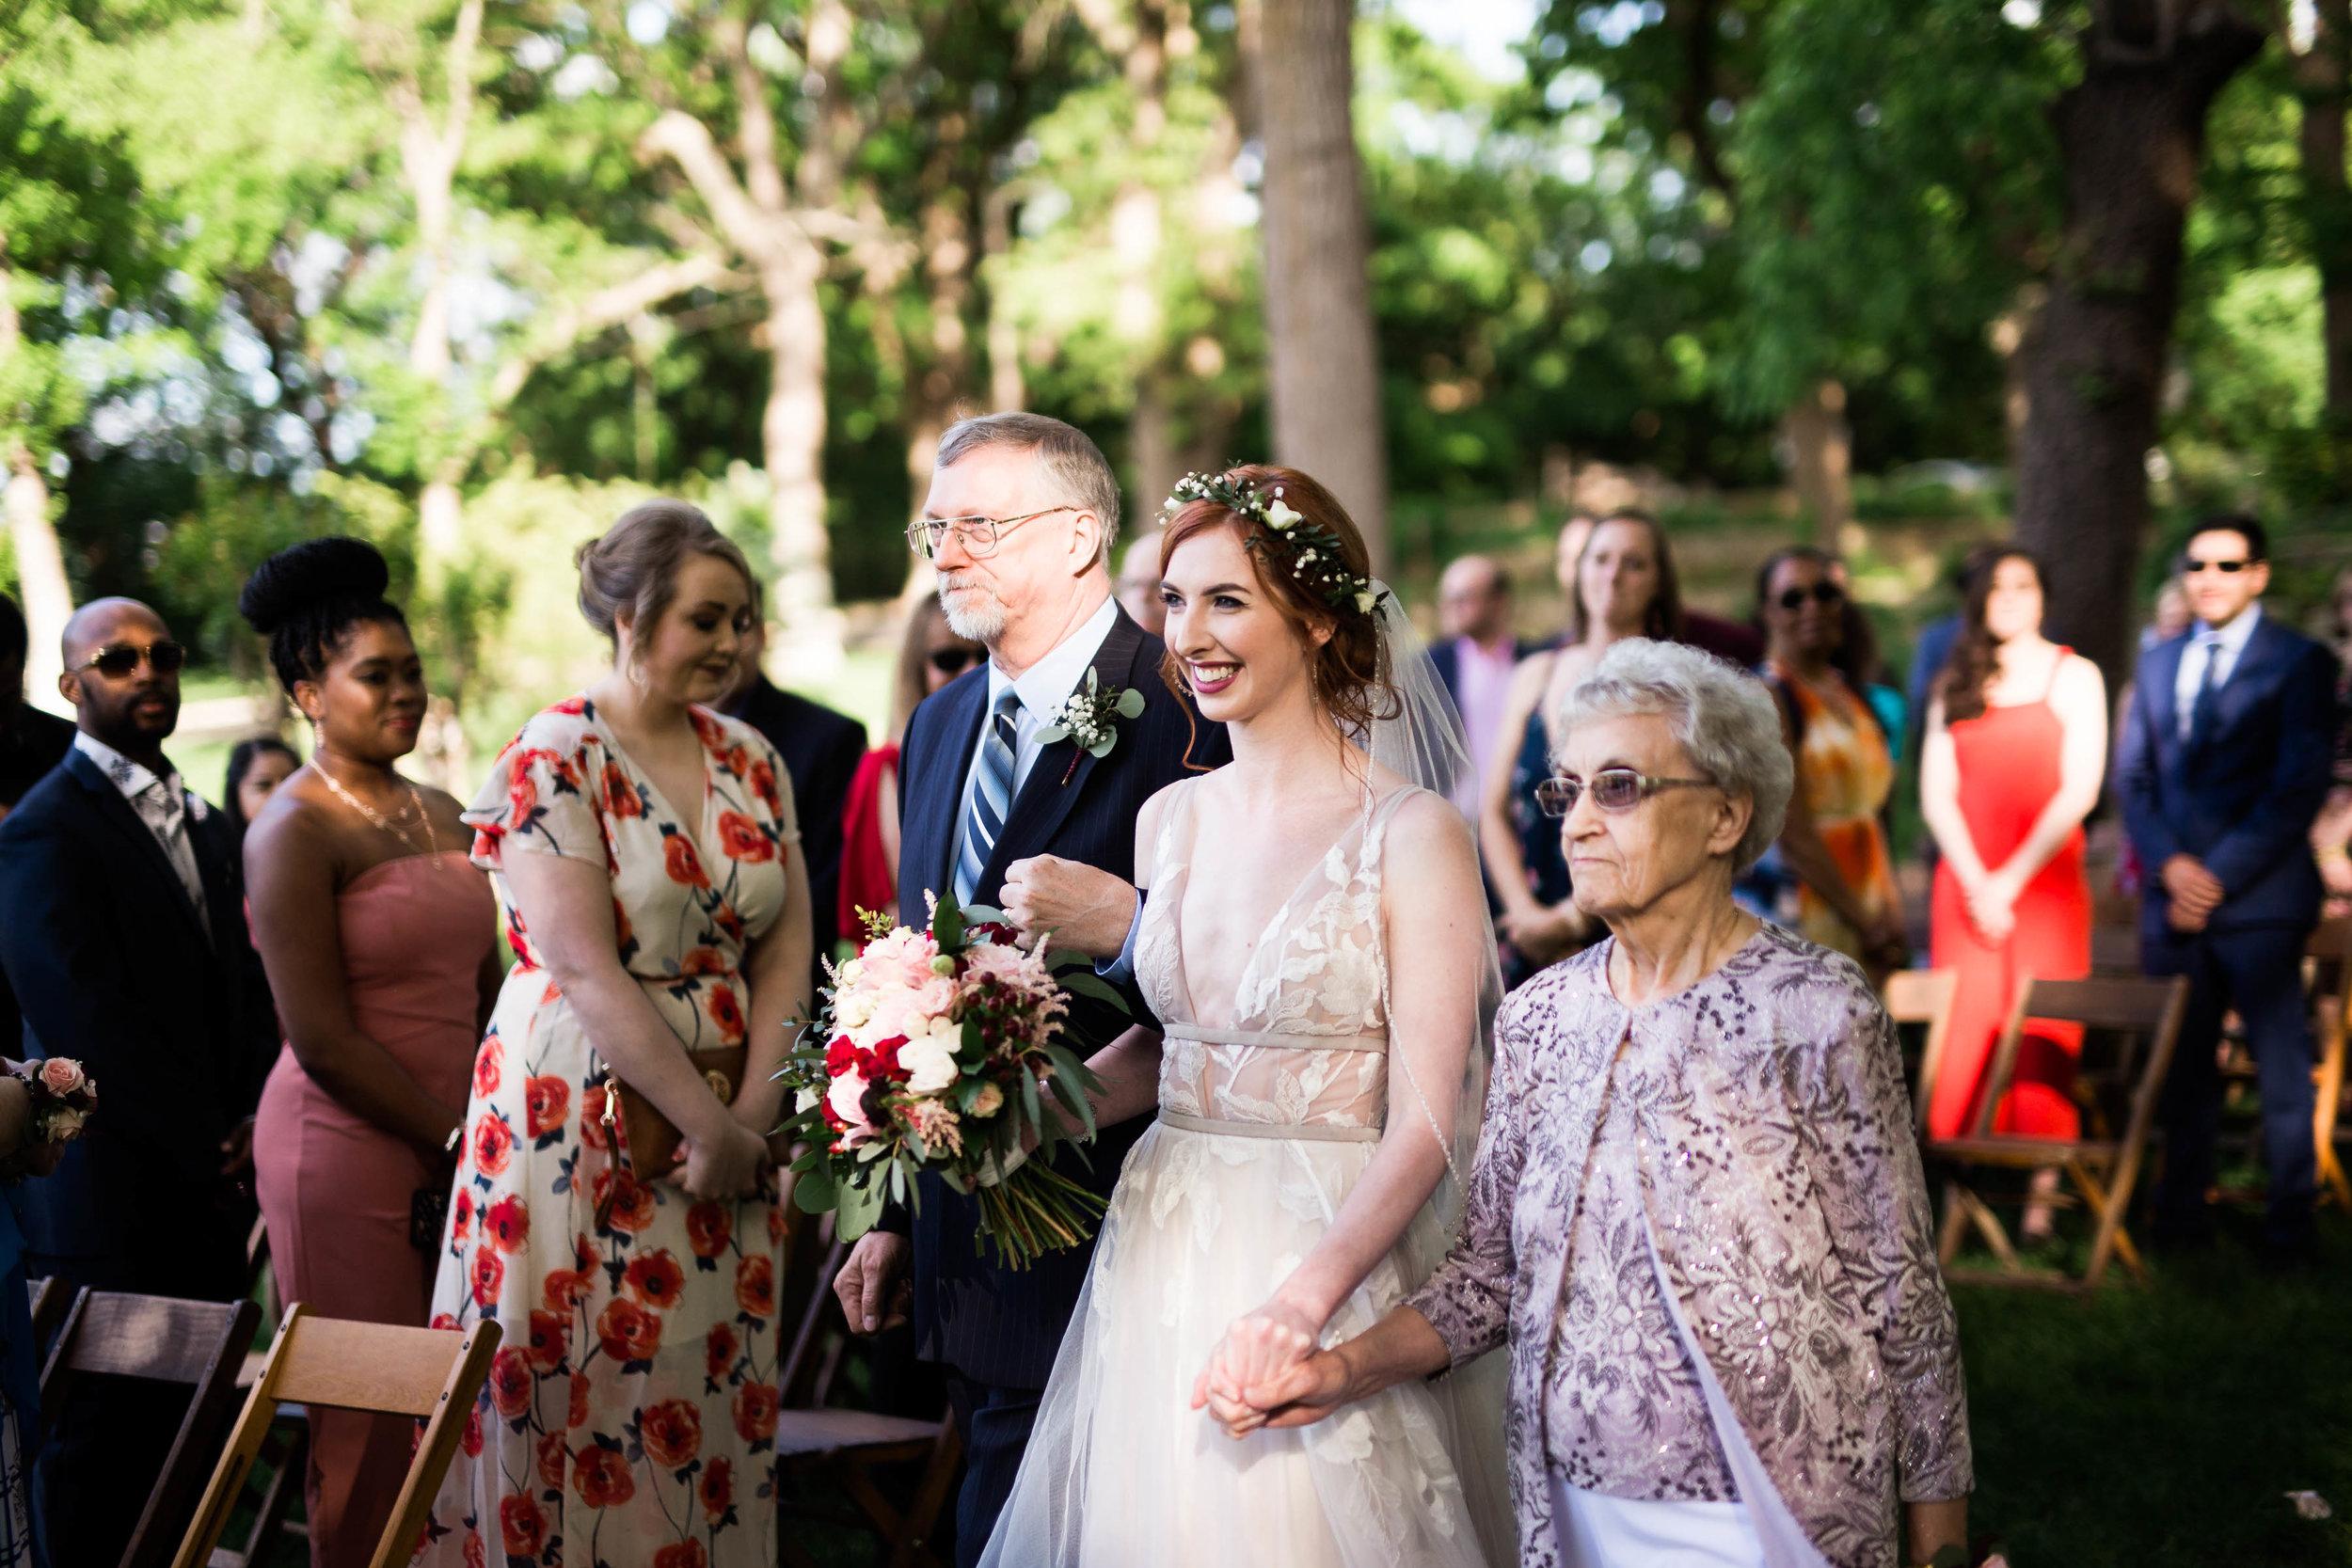 armstrong-wedding-456.jpg